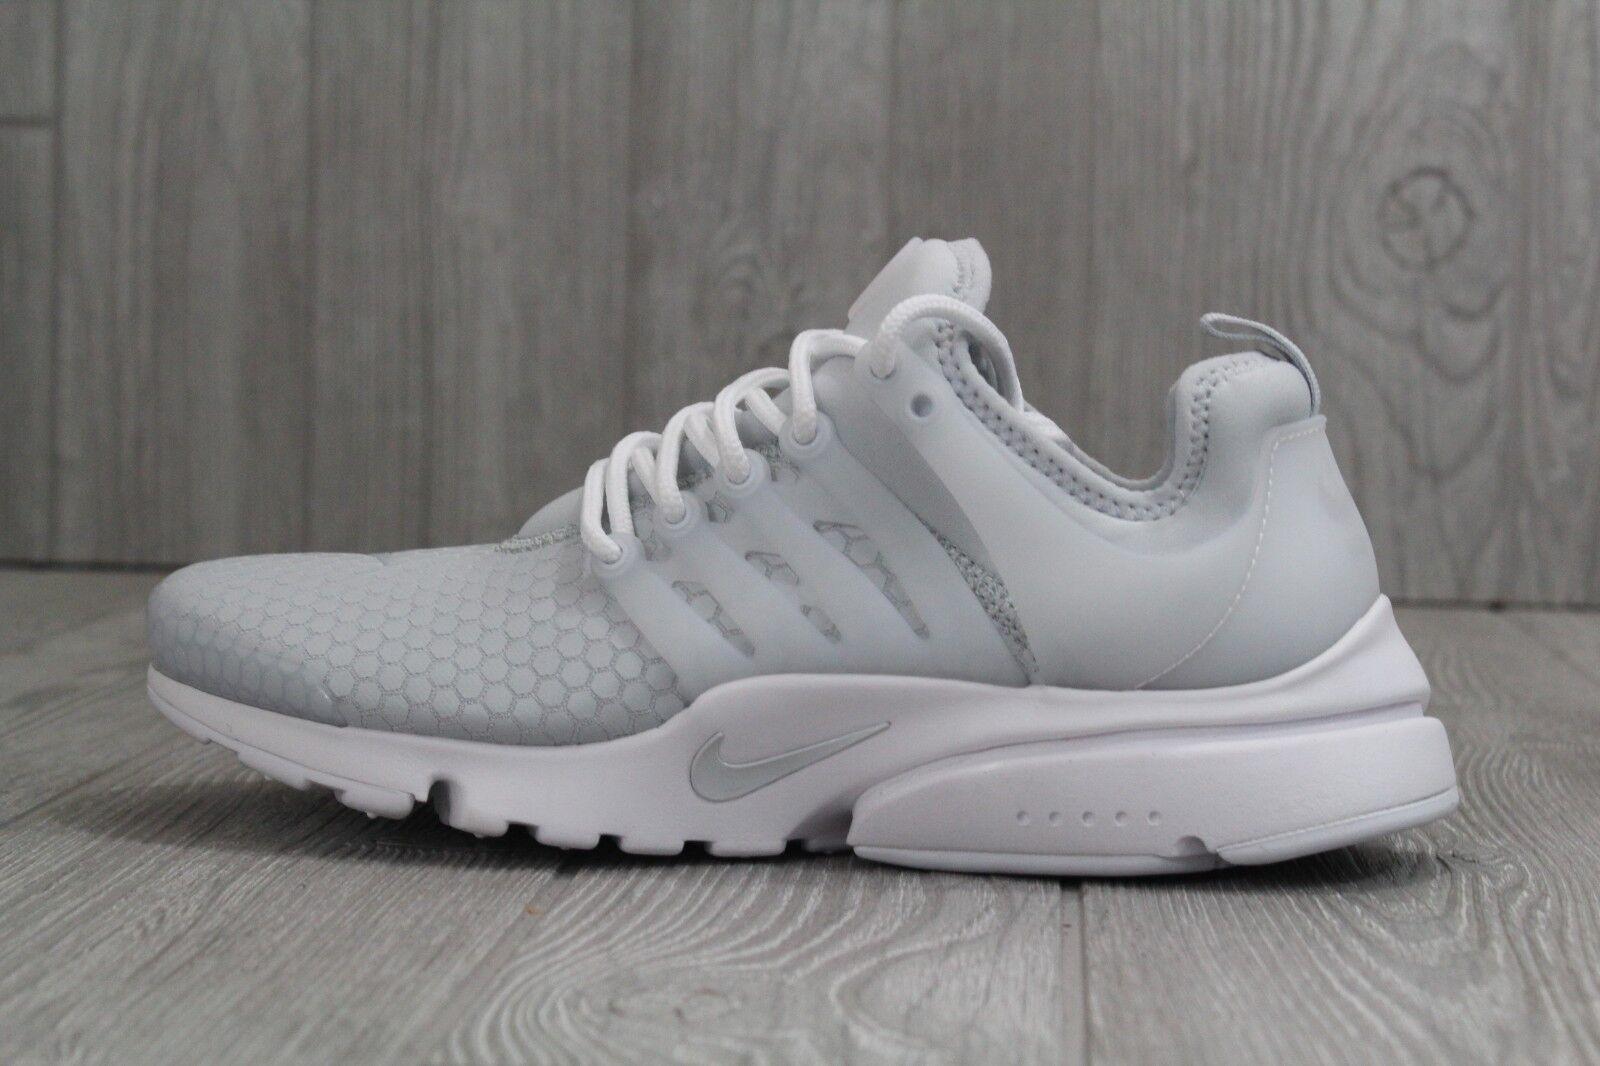 31 Nike Air Presto Ultra SE Pure Platinum shoes Men's Size 8.5  918241 100